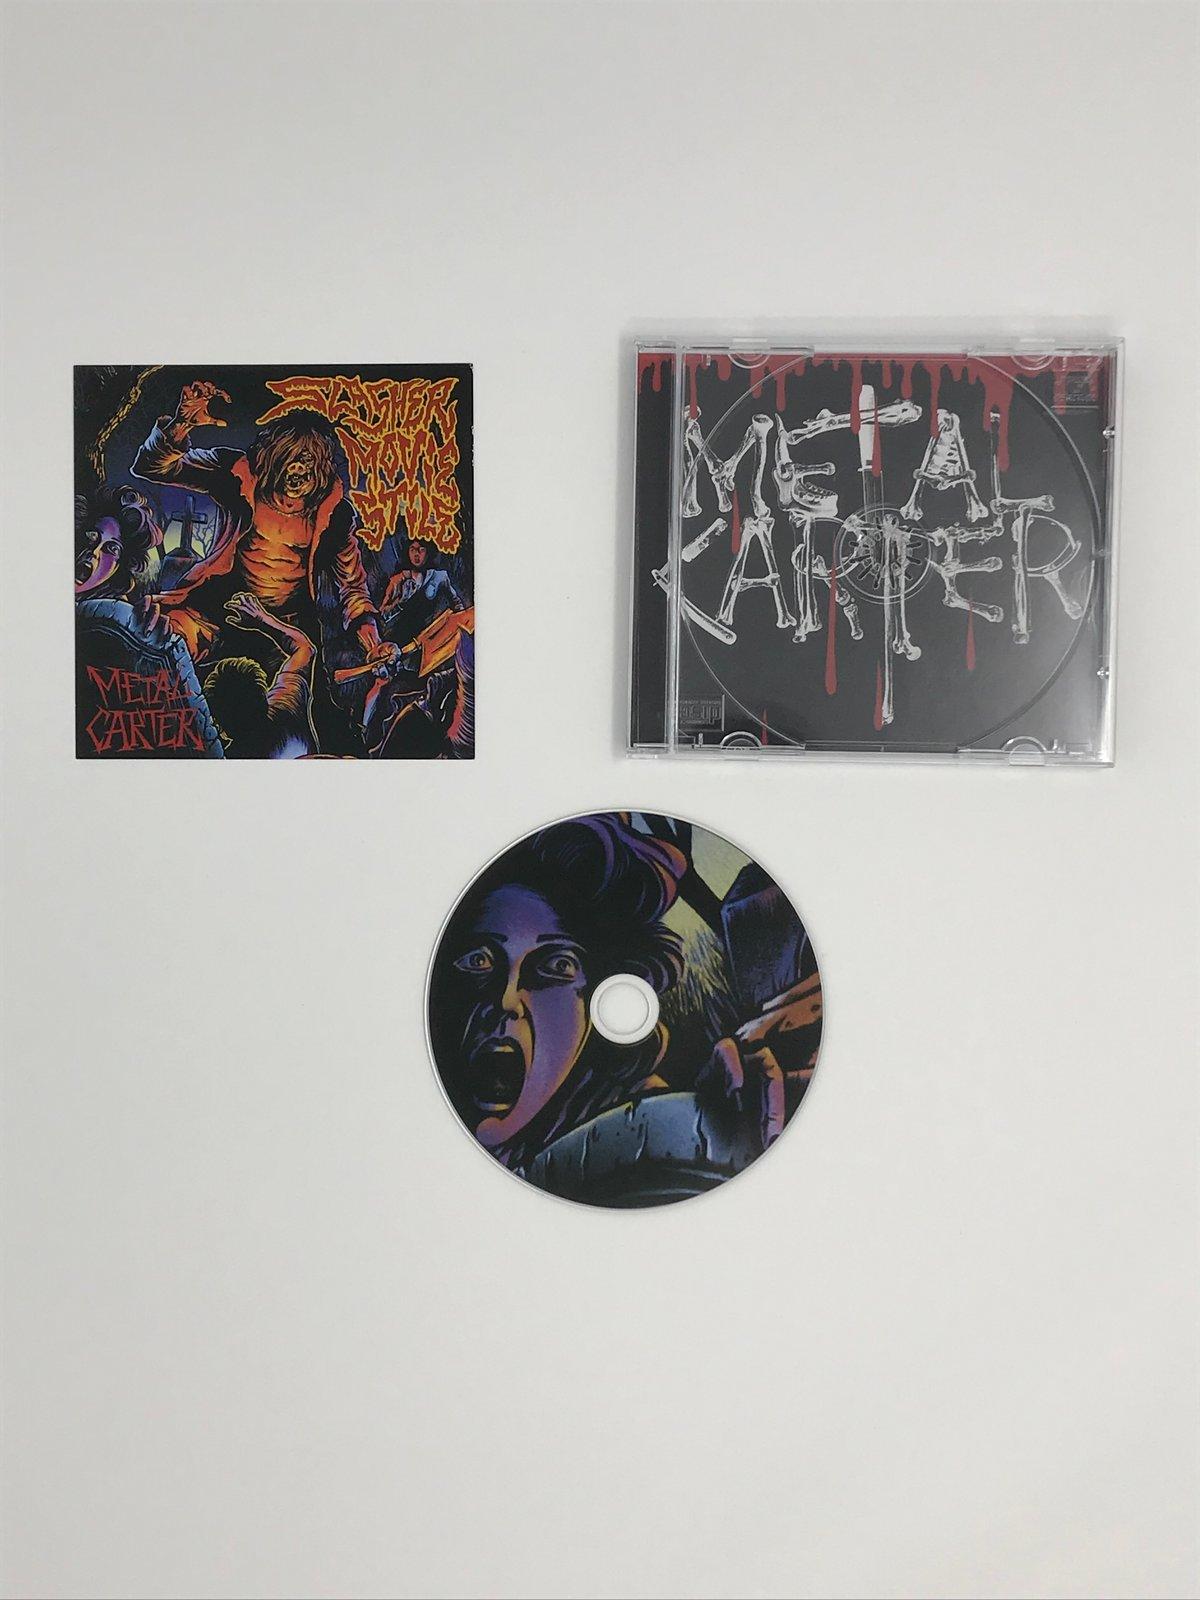 Image of SLASHER MOVIE STILE metal carter